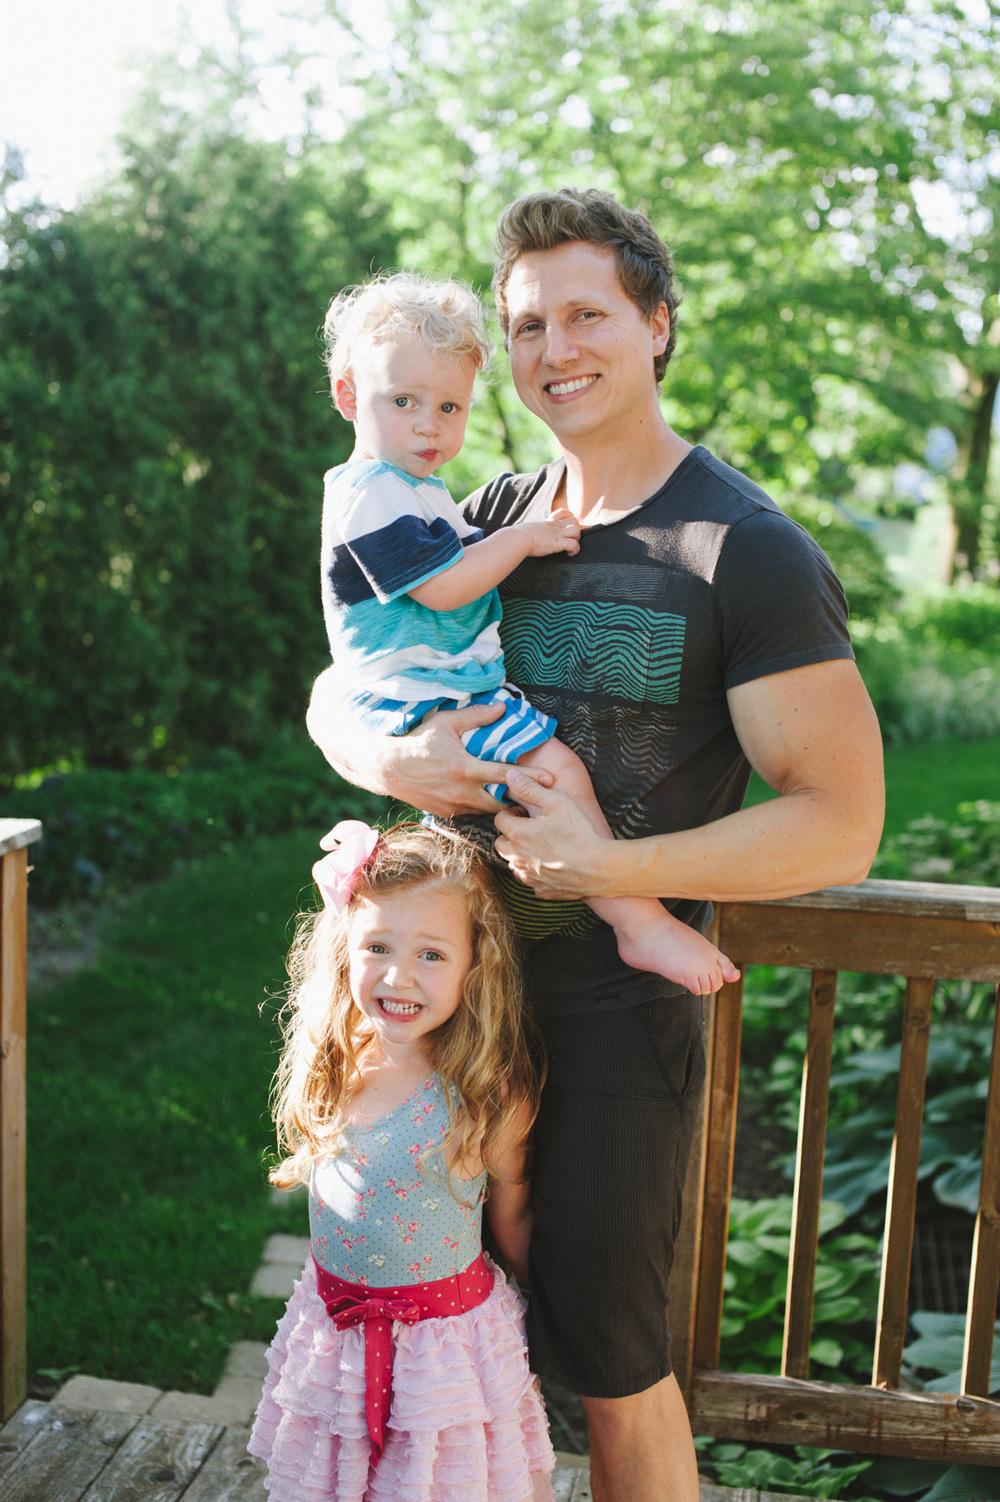 20130616_Fathers_Day__APB5369.jpg